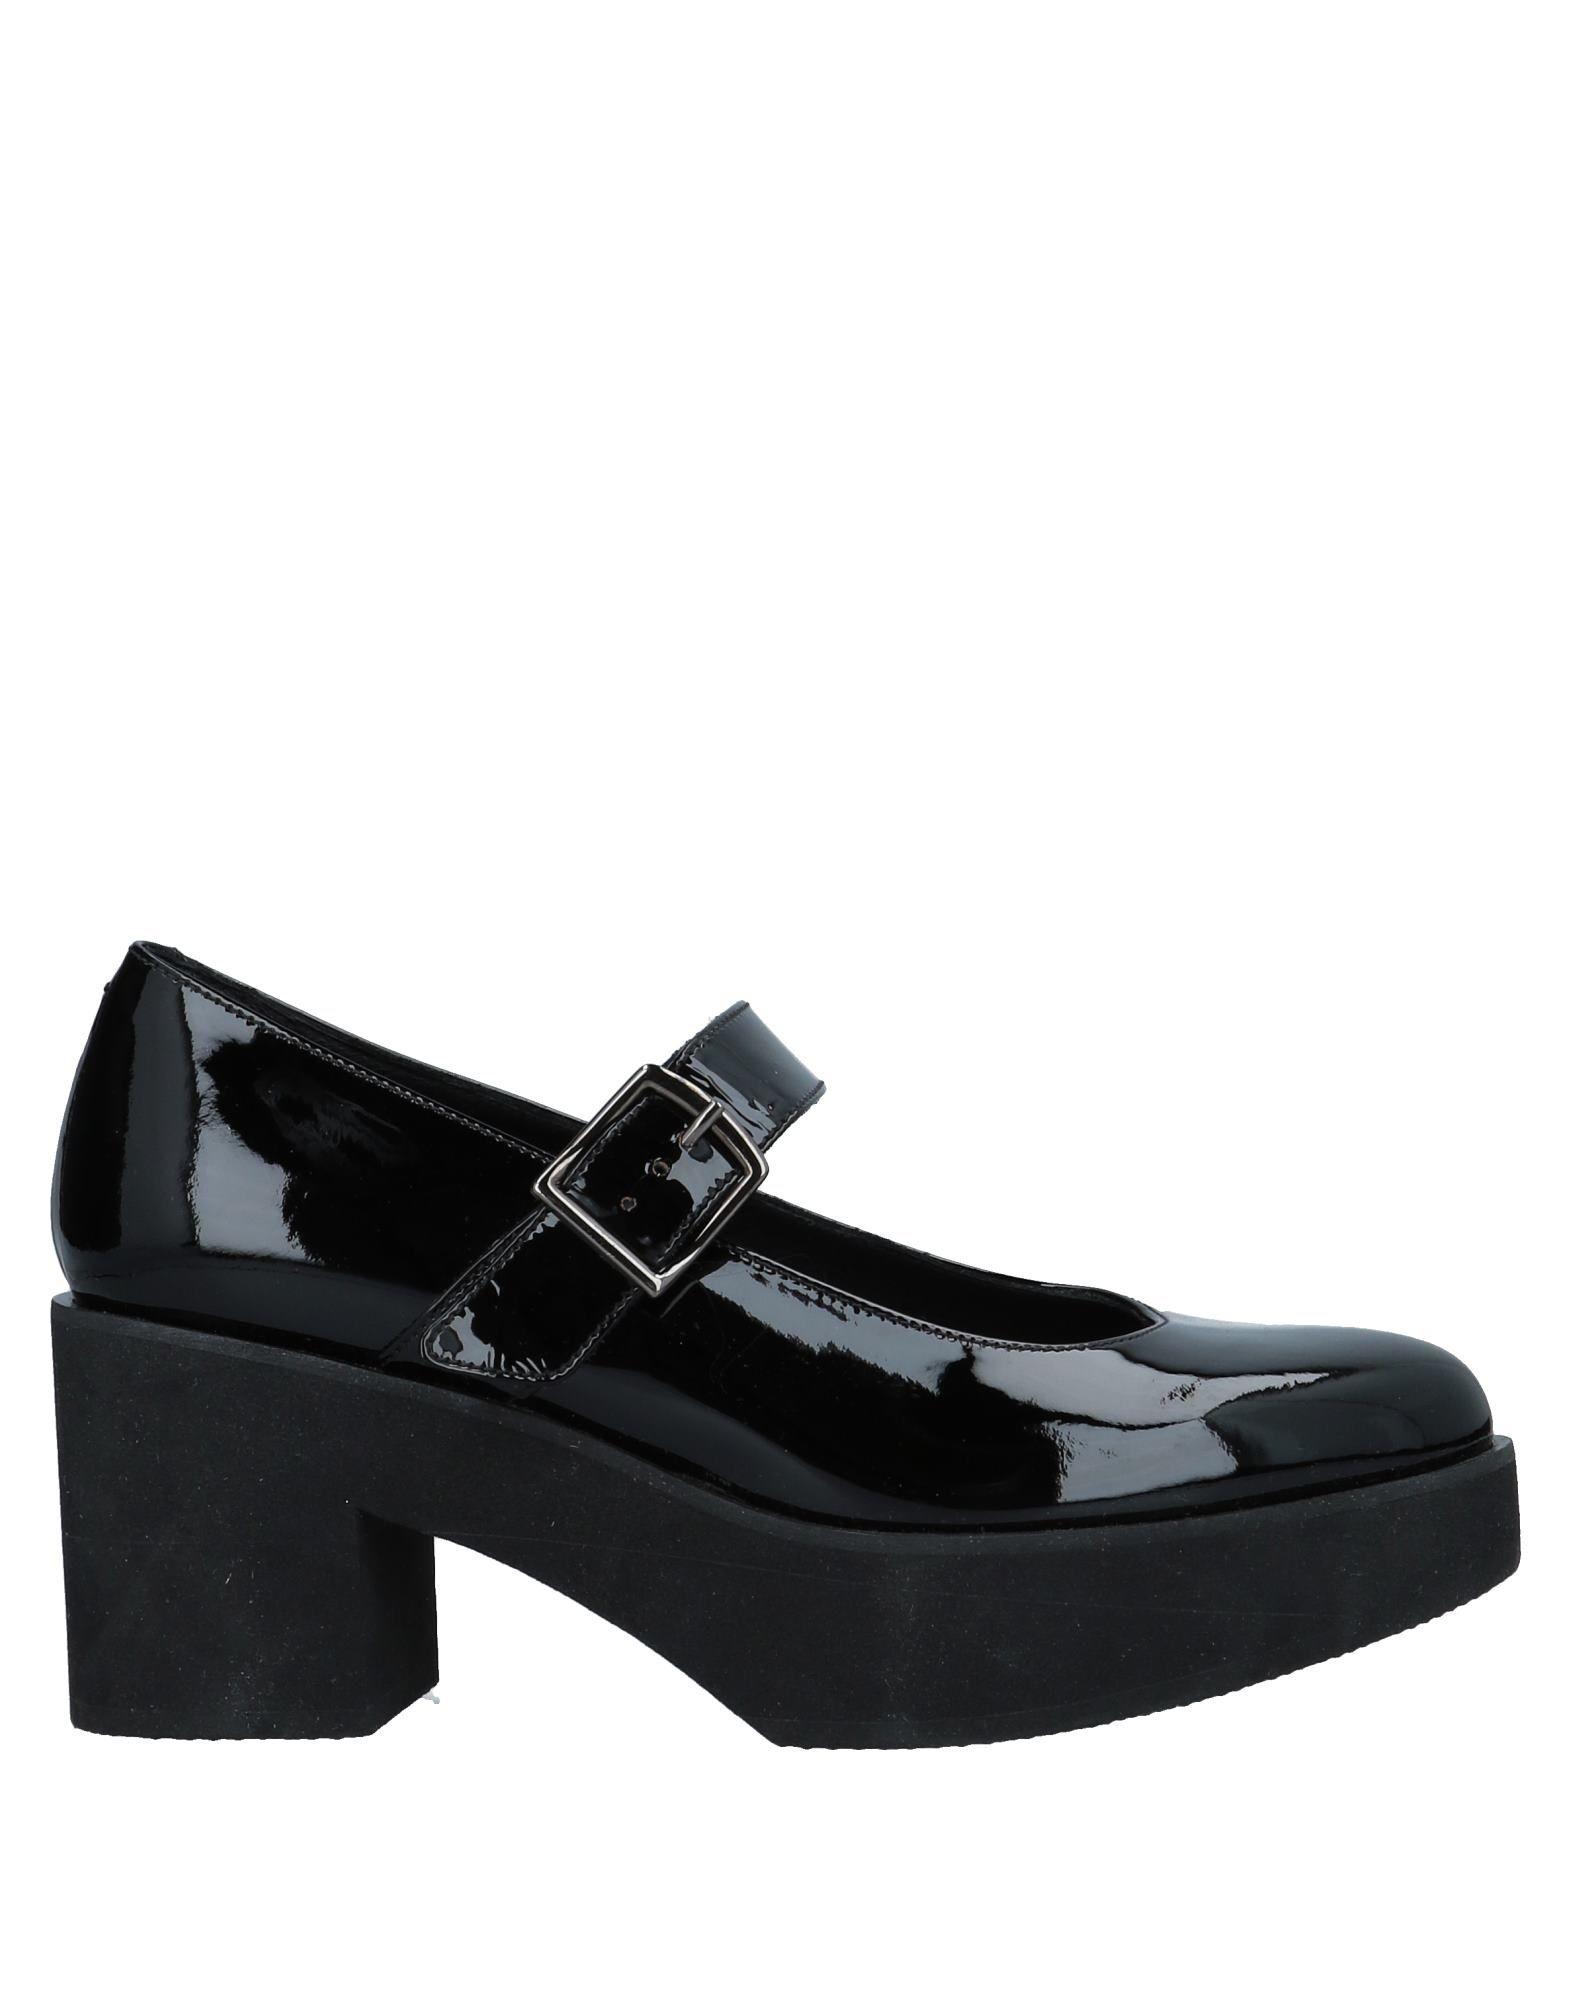 Fratelli Rossetti Pumps Damen  11548722FDGut aussehende strapazierfähige Schuhe